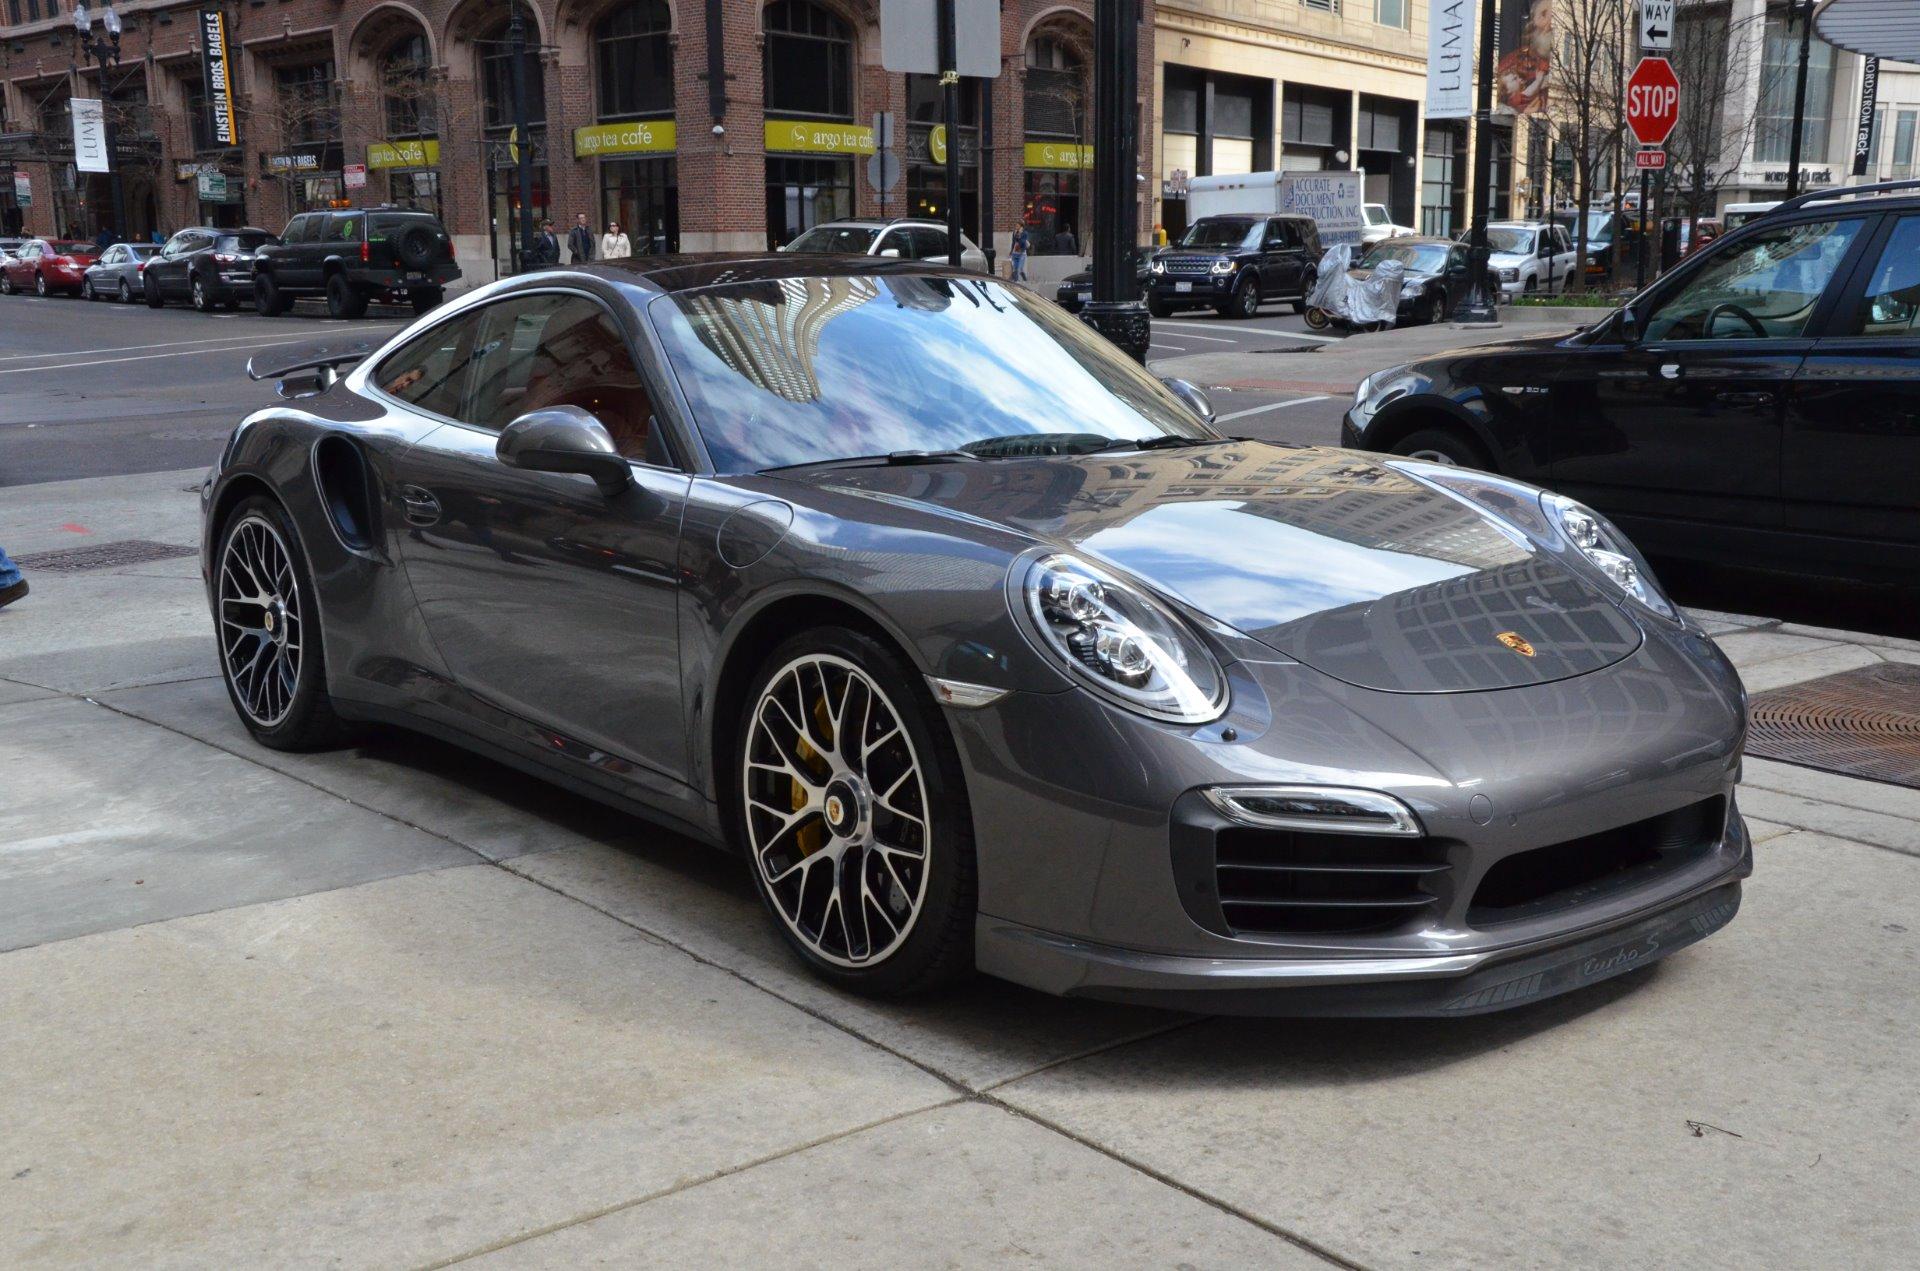 2014 porsche 911 turbo s stock r224ba for sale near chicago il il porsche dealer. Black Bedroom Furniture Sets. Home Design Ideas